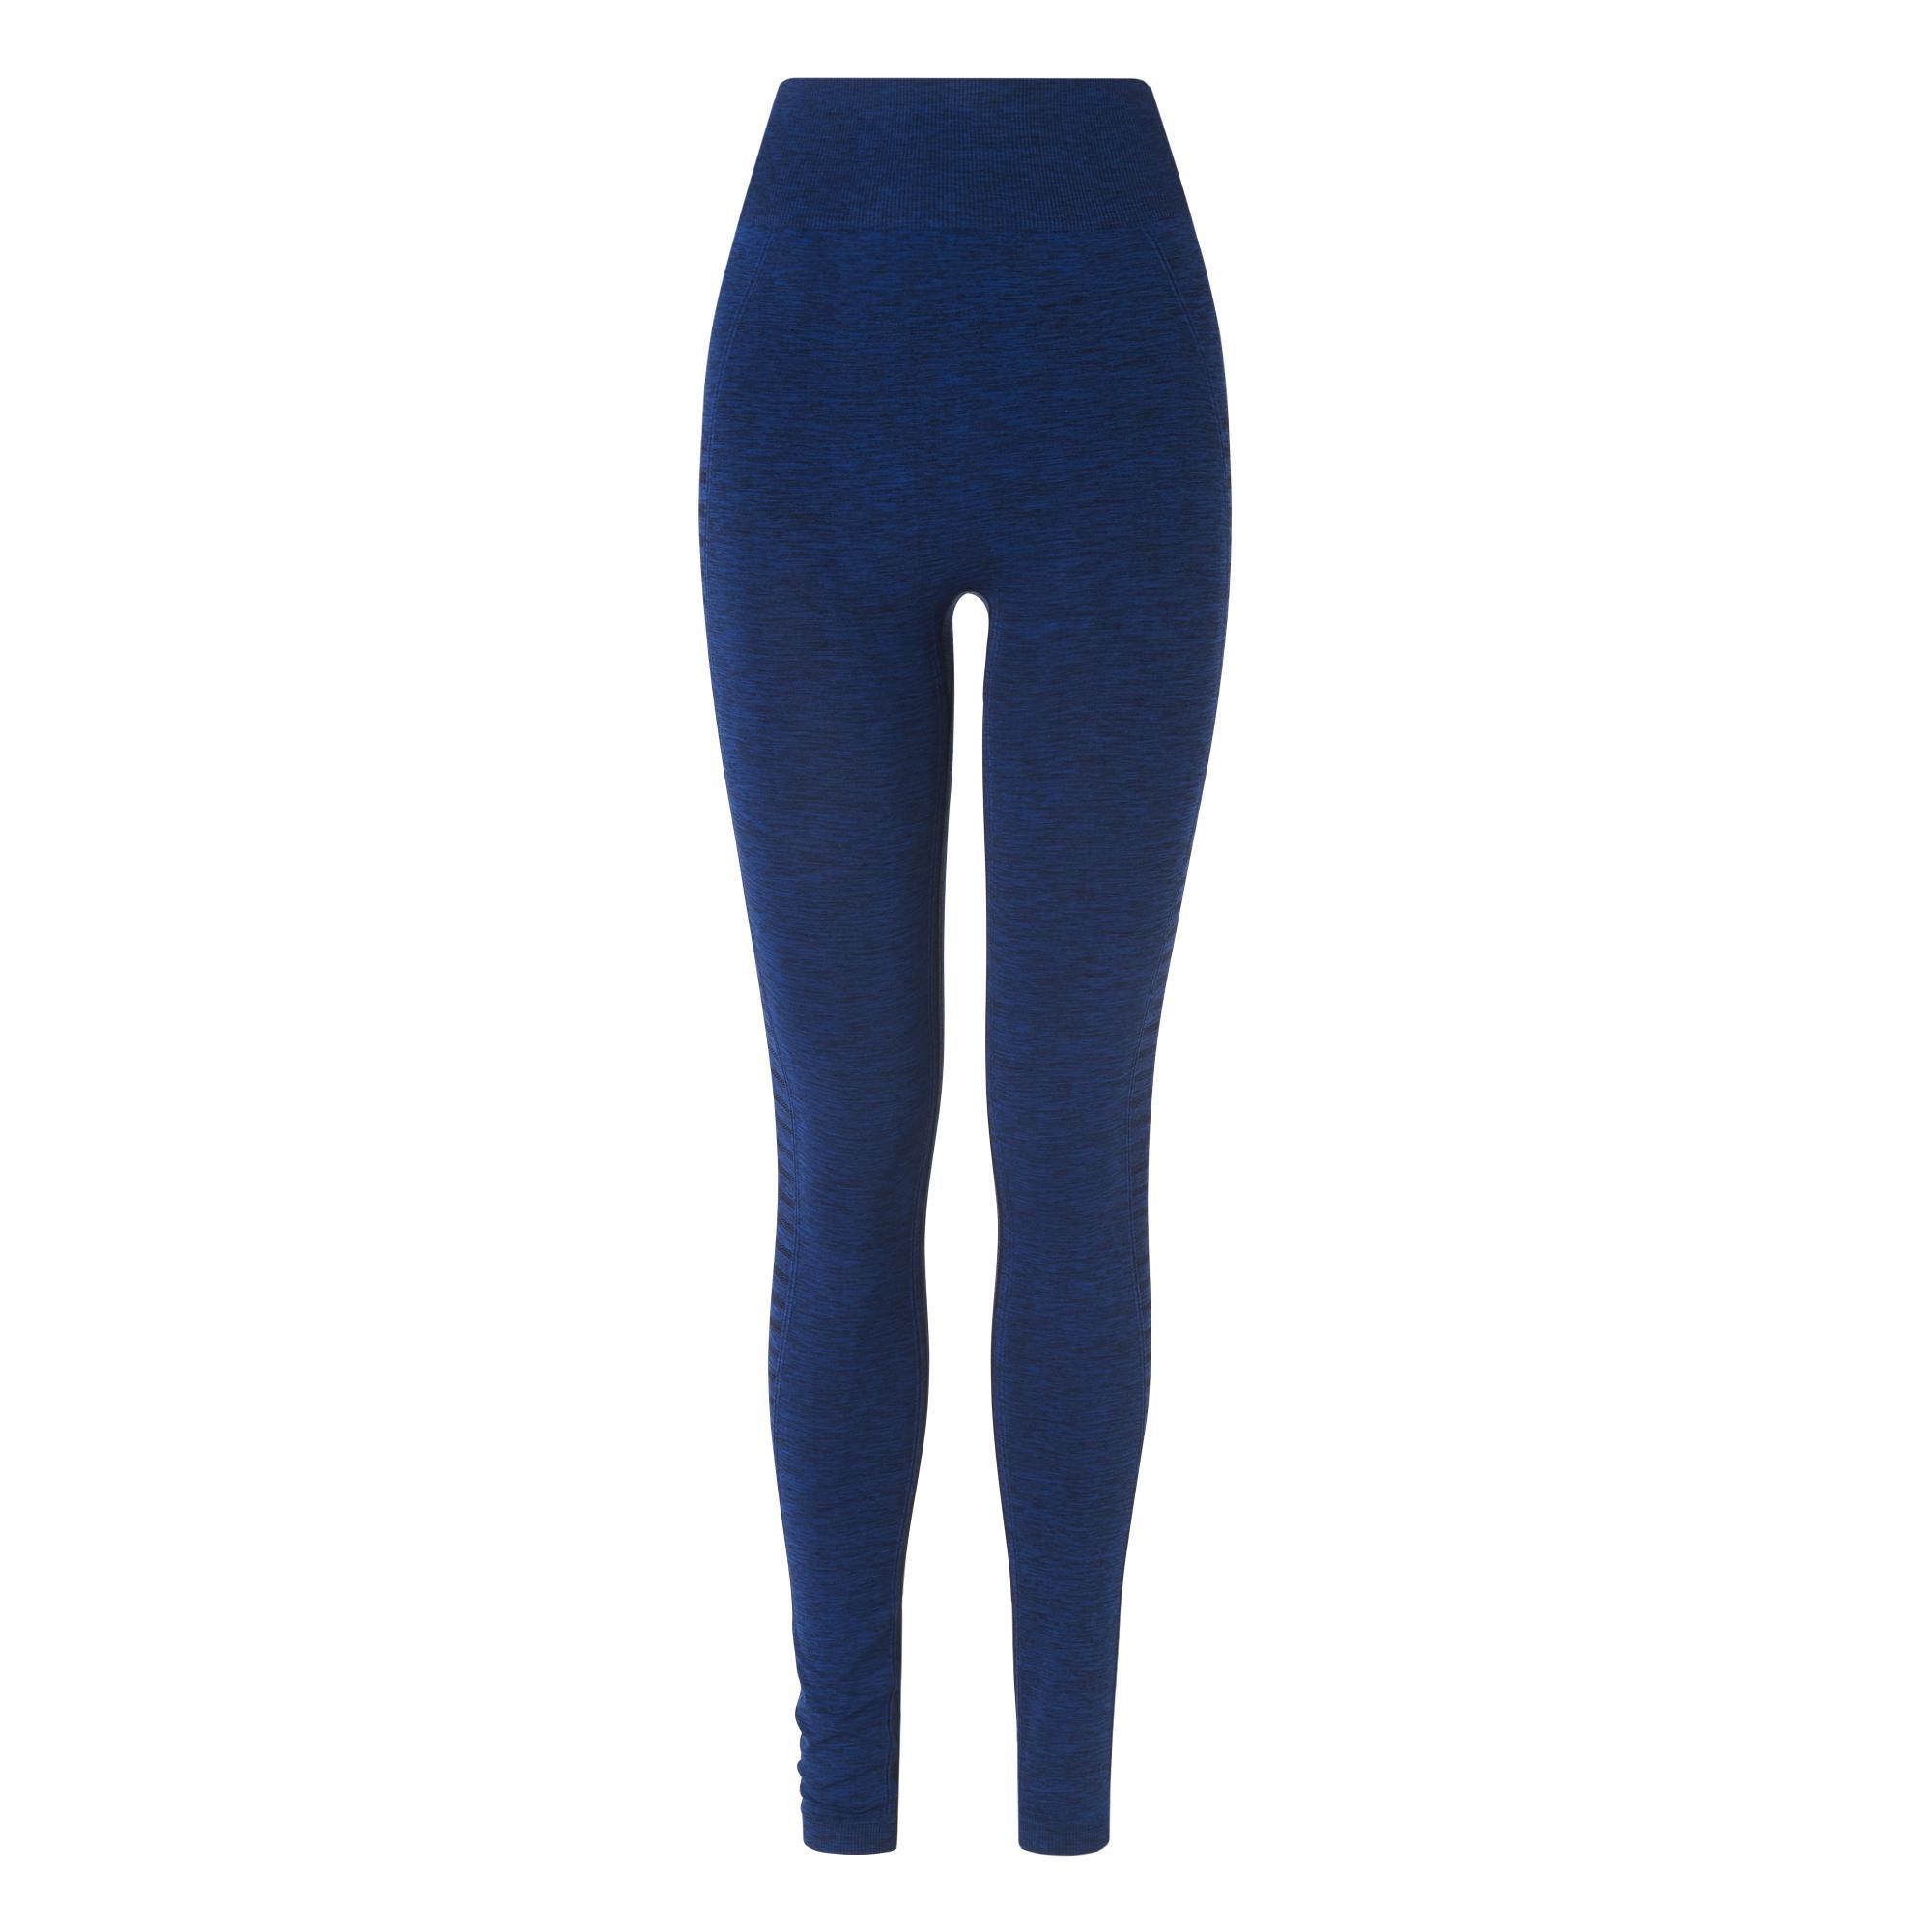 Heidi Blue Stripe Pants